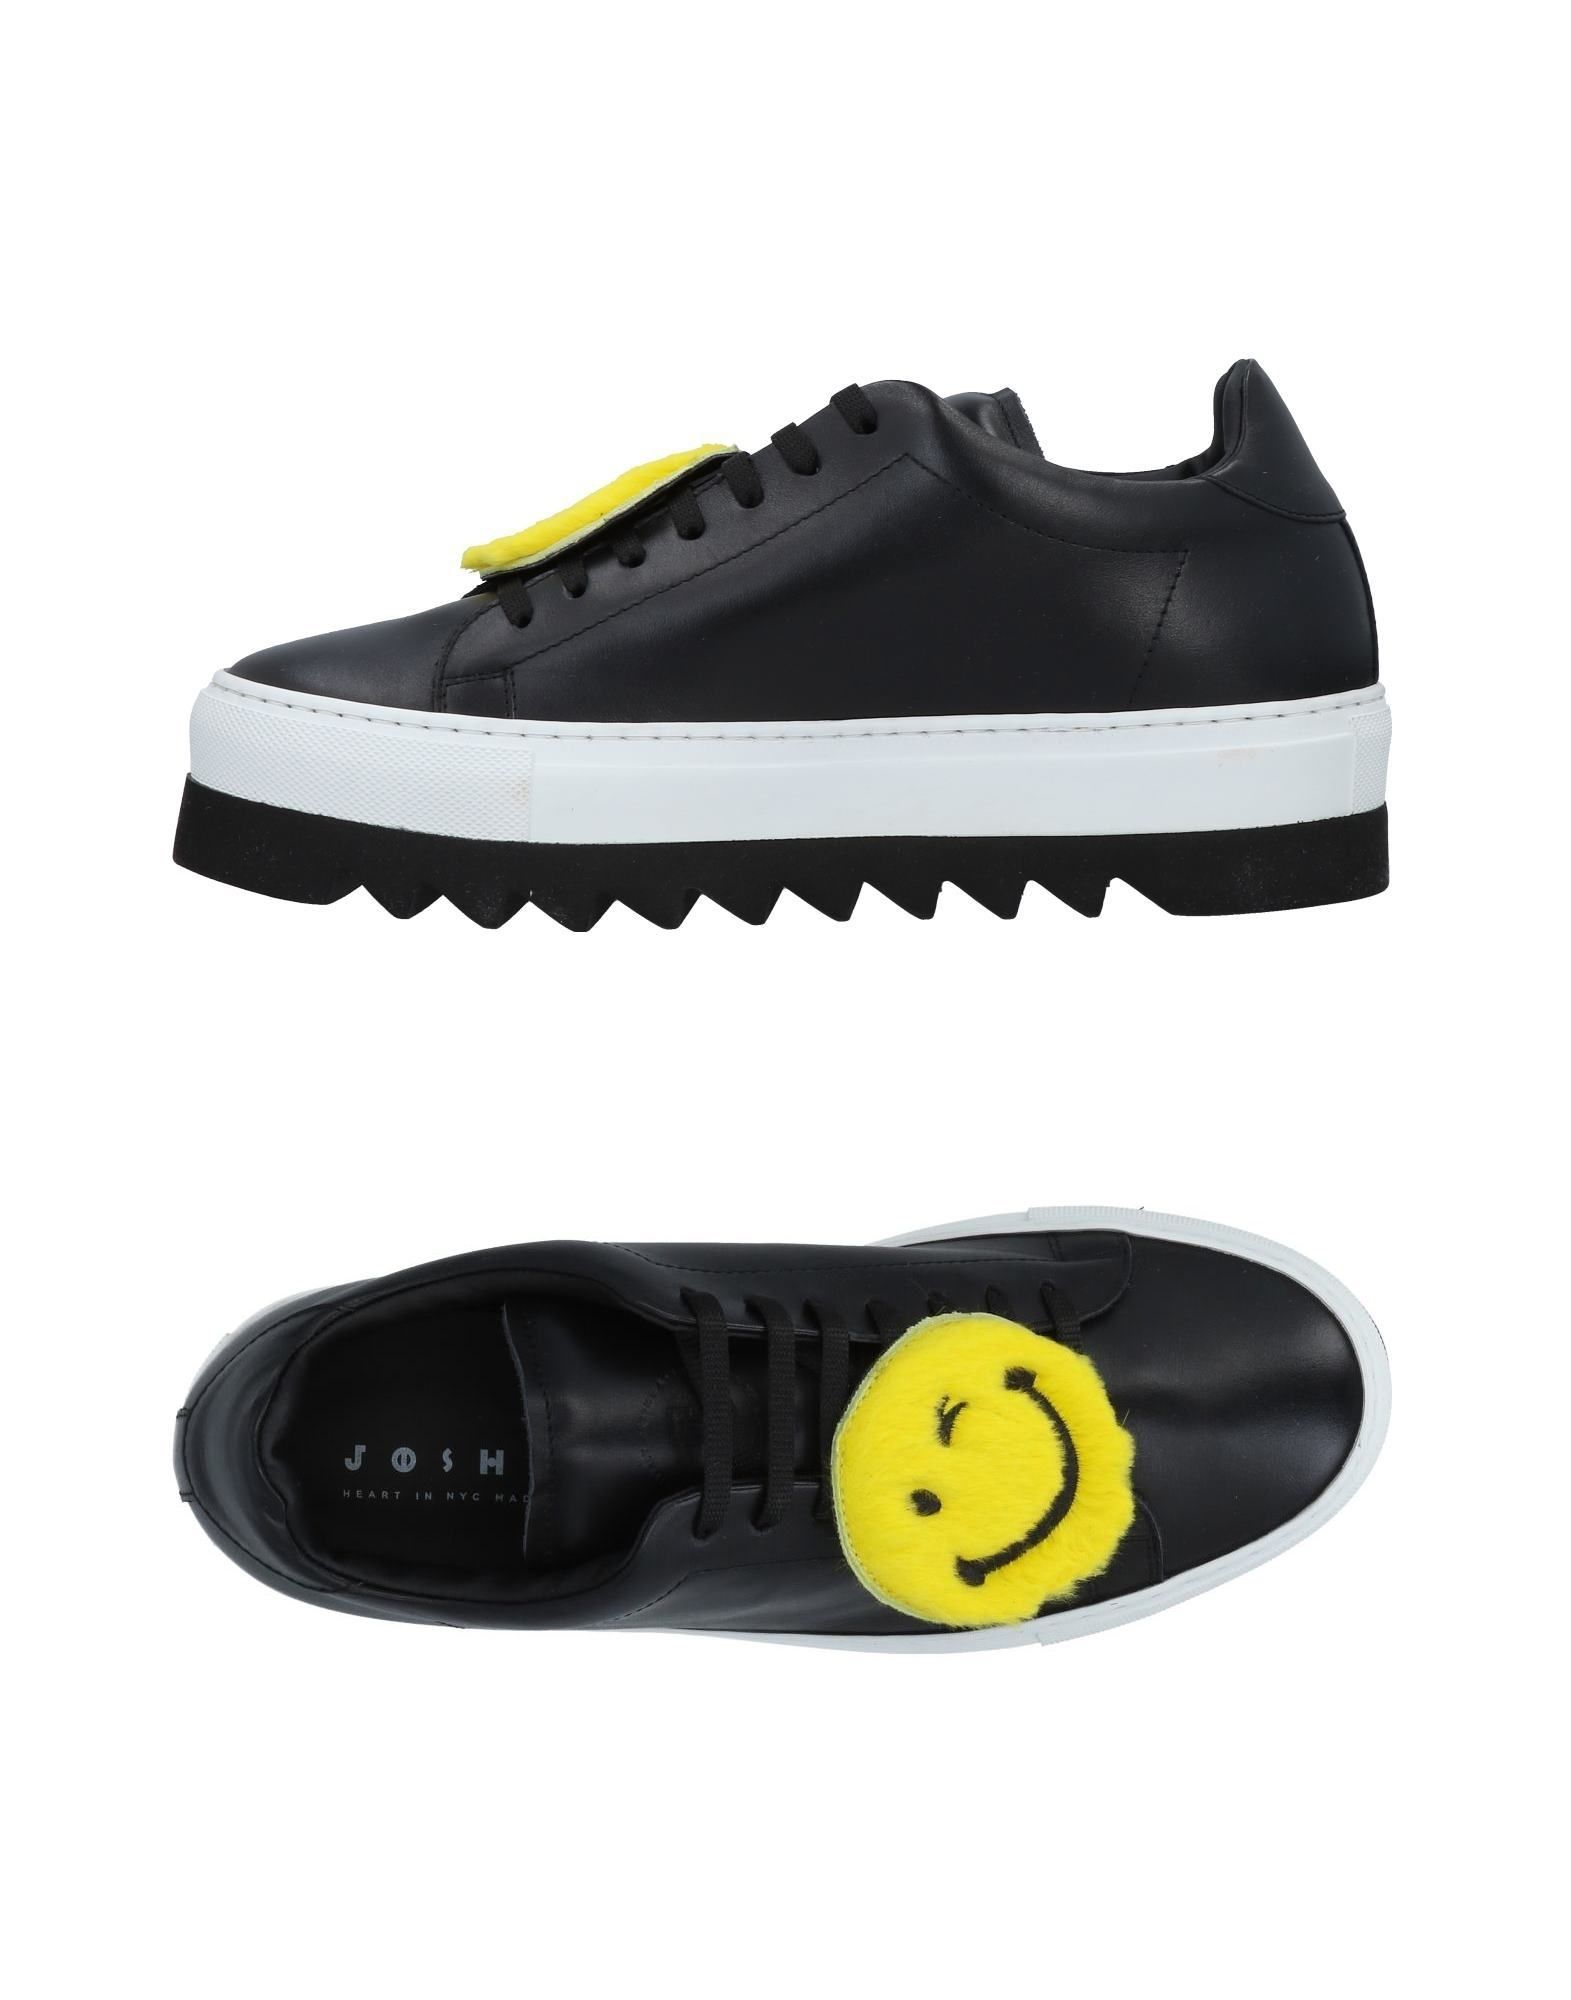 Joshua*S Sneakers Damen  11494411HJGut aussehende strapazierfähige Schuhe